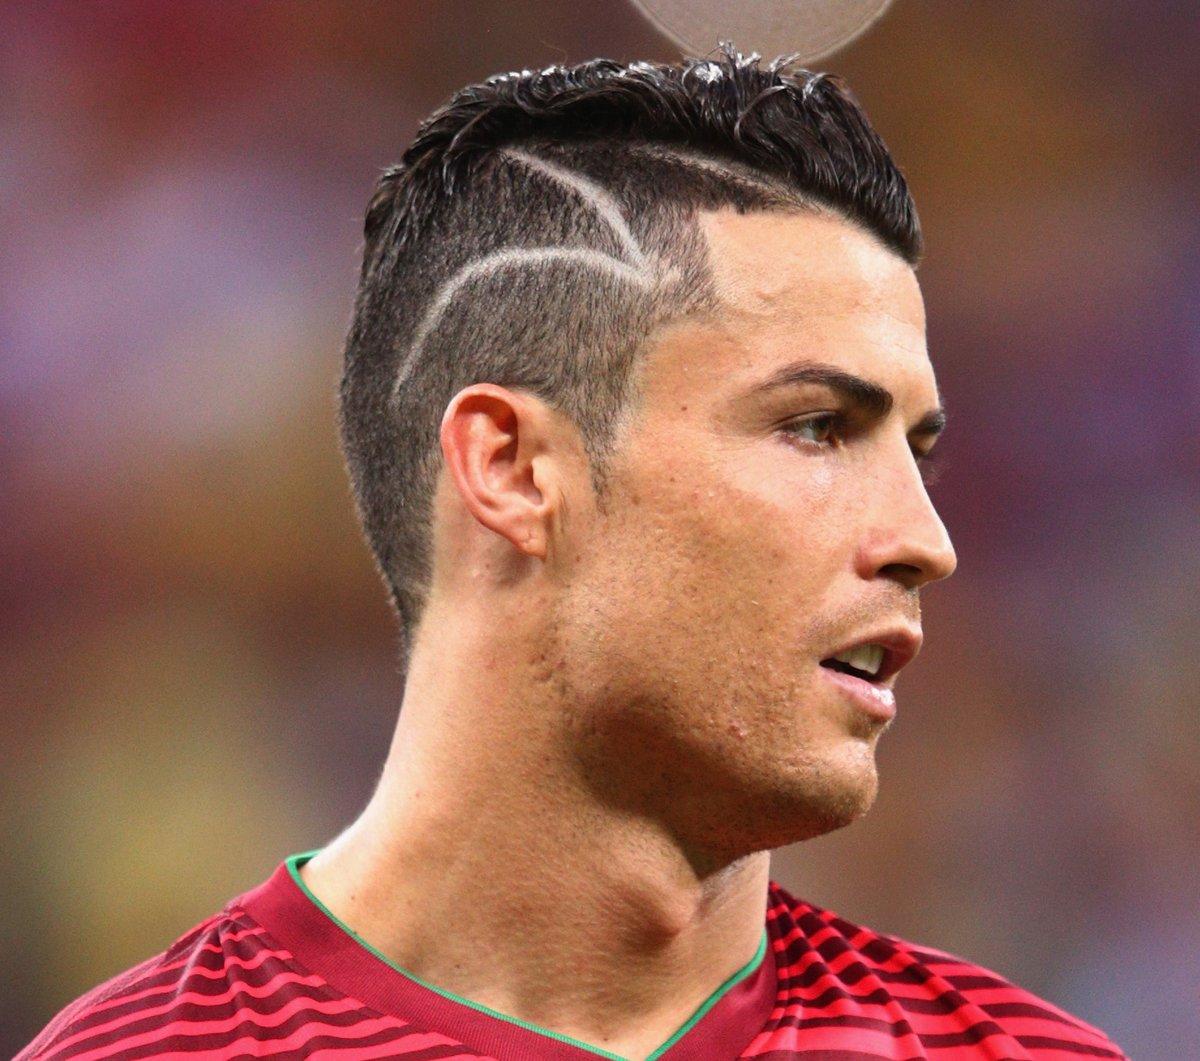 ronaldo hairstyle to make - 768×677